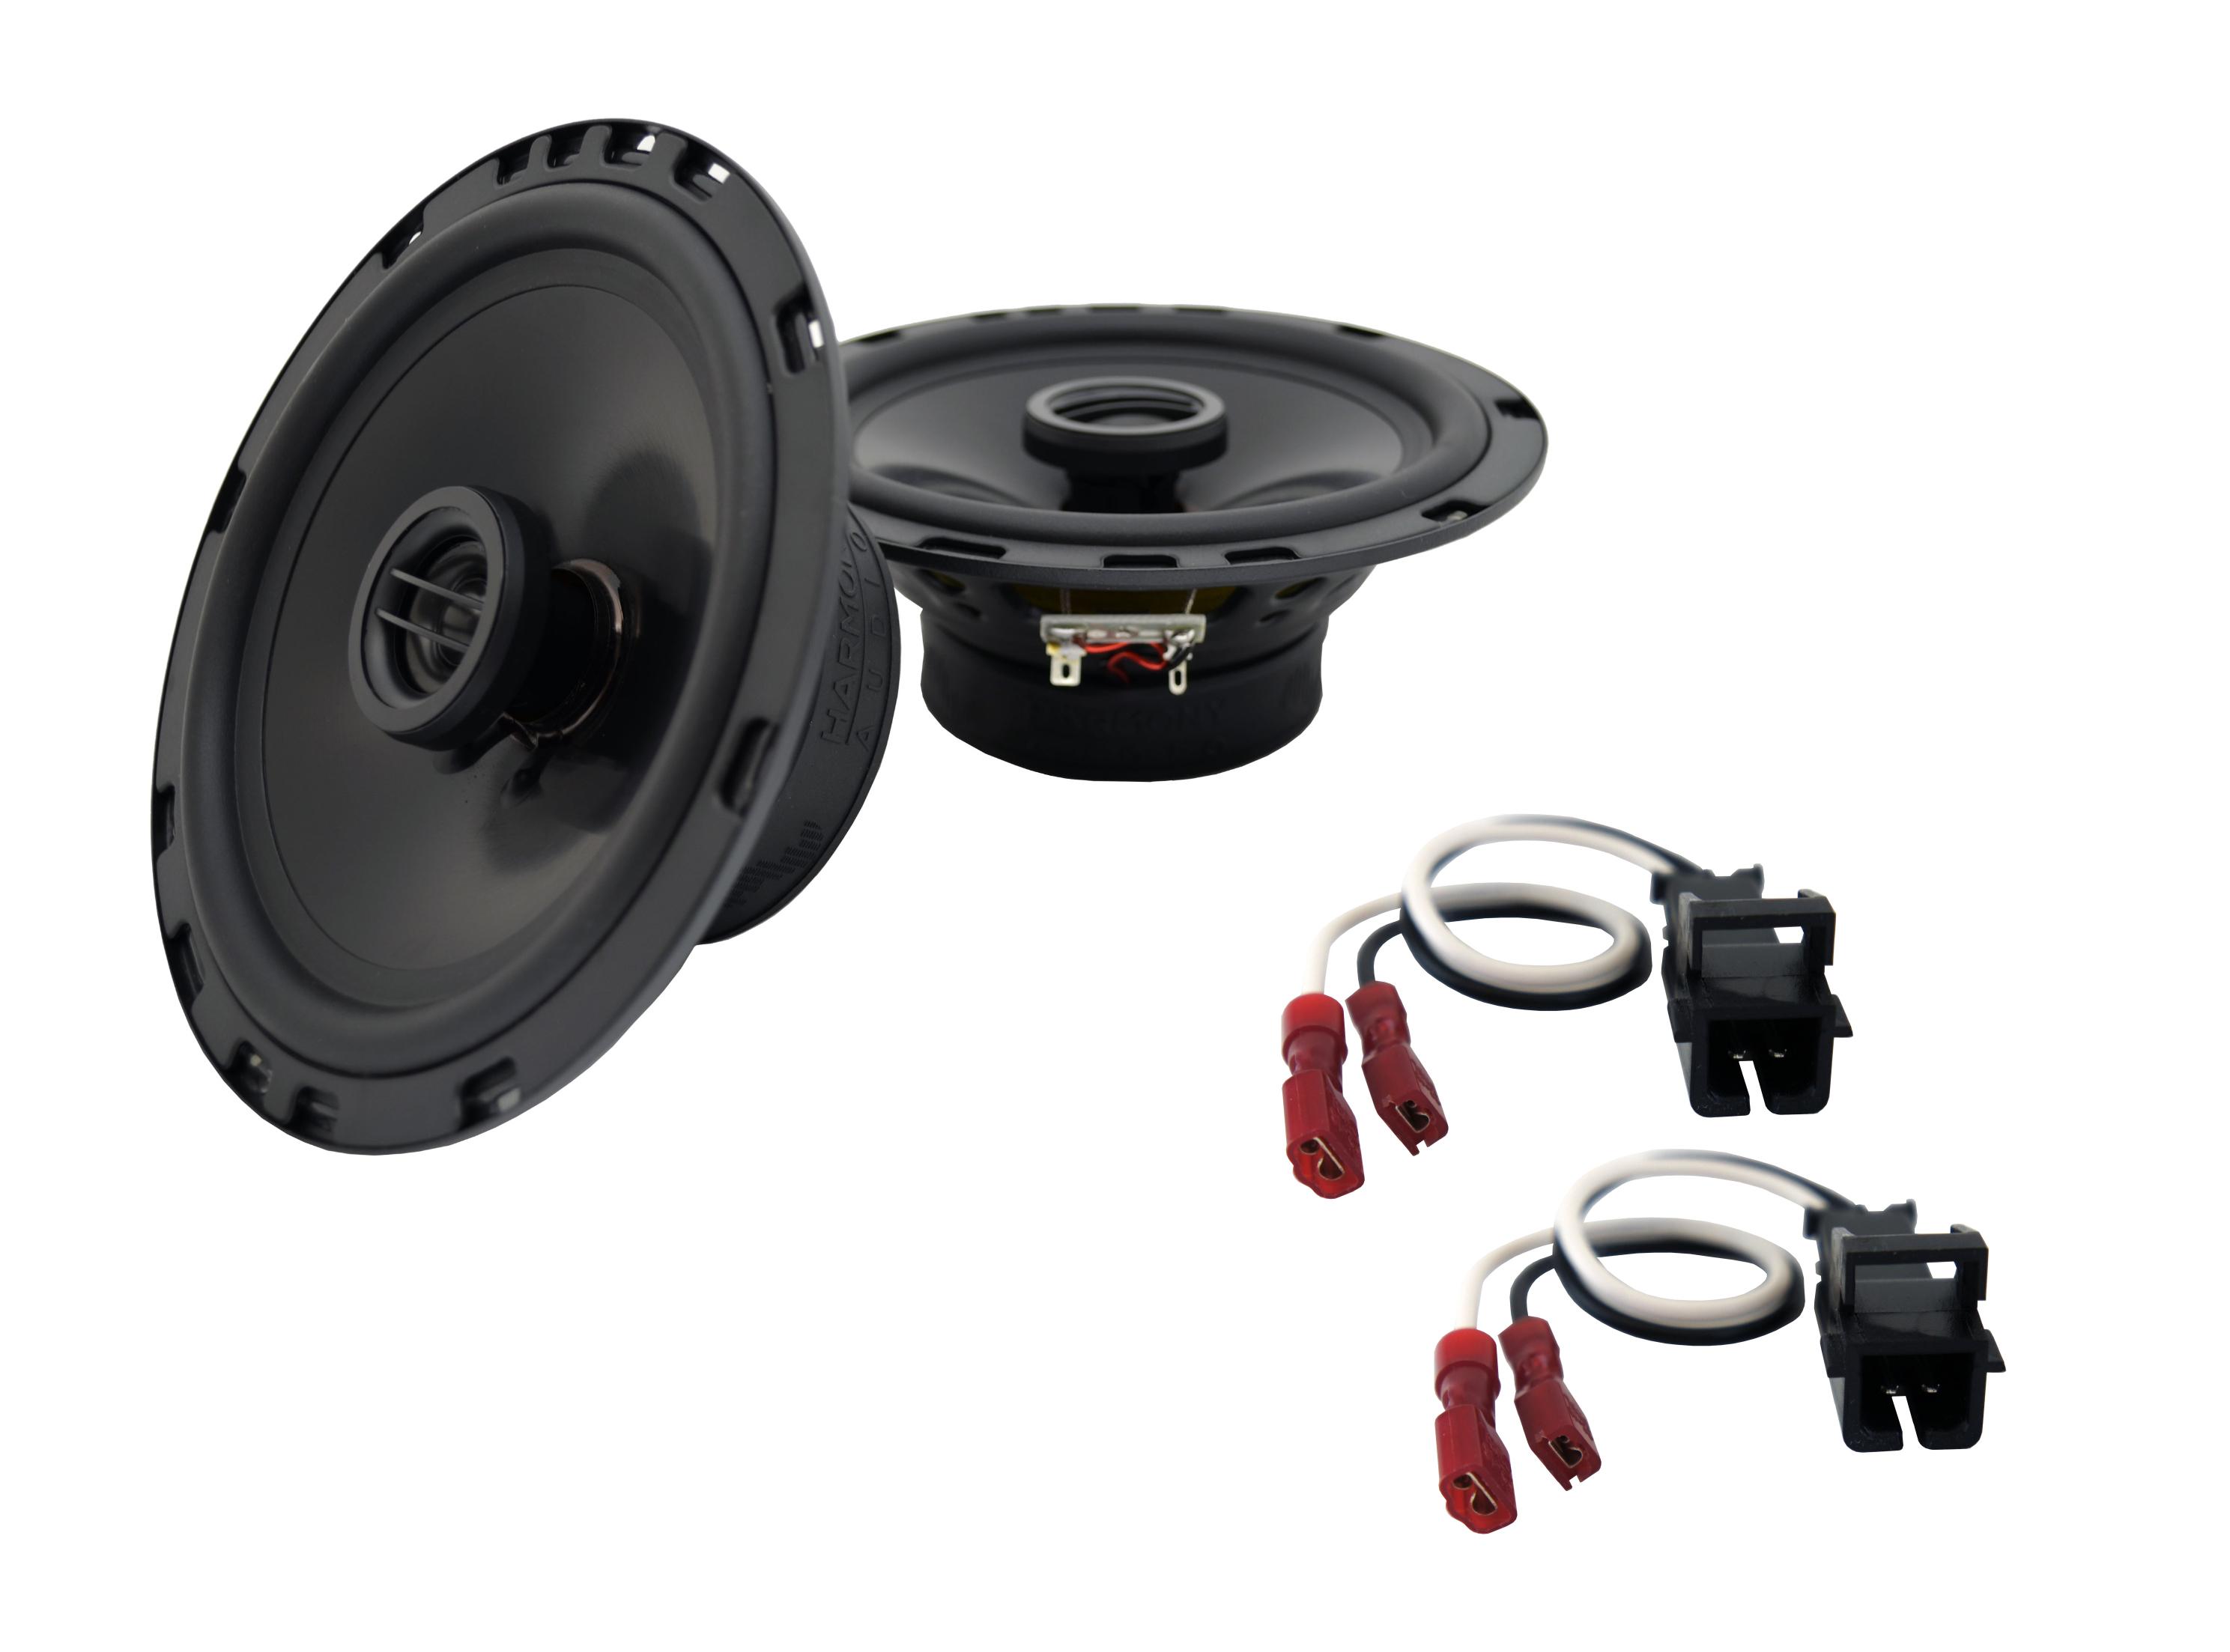 Fits Isuzu Ascender 2003-2008 Rear Door Replacement Harmony HA-R65 Speakers New